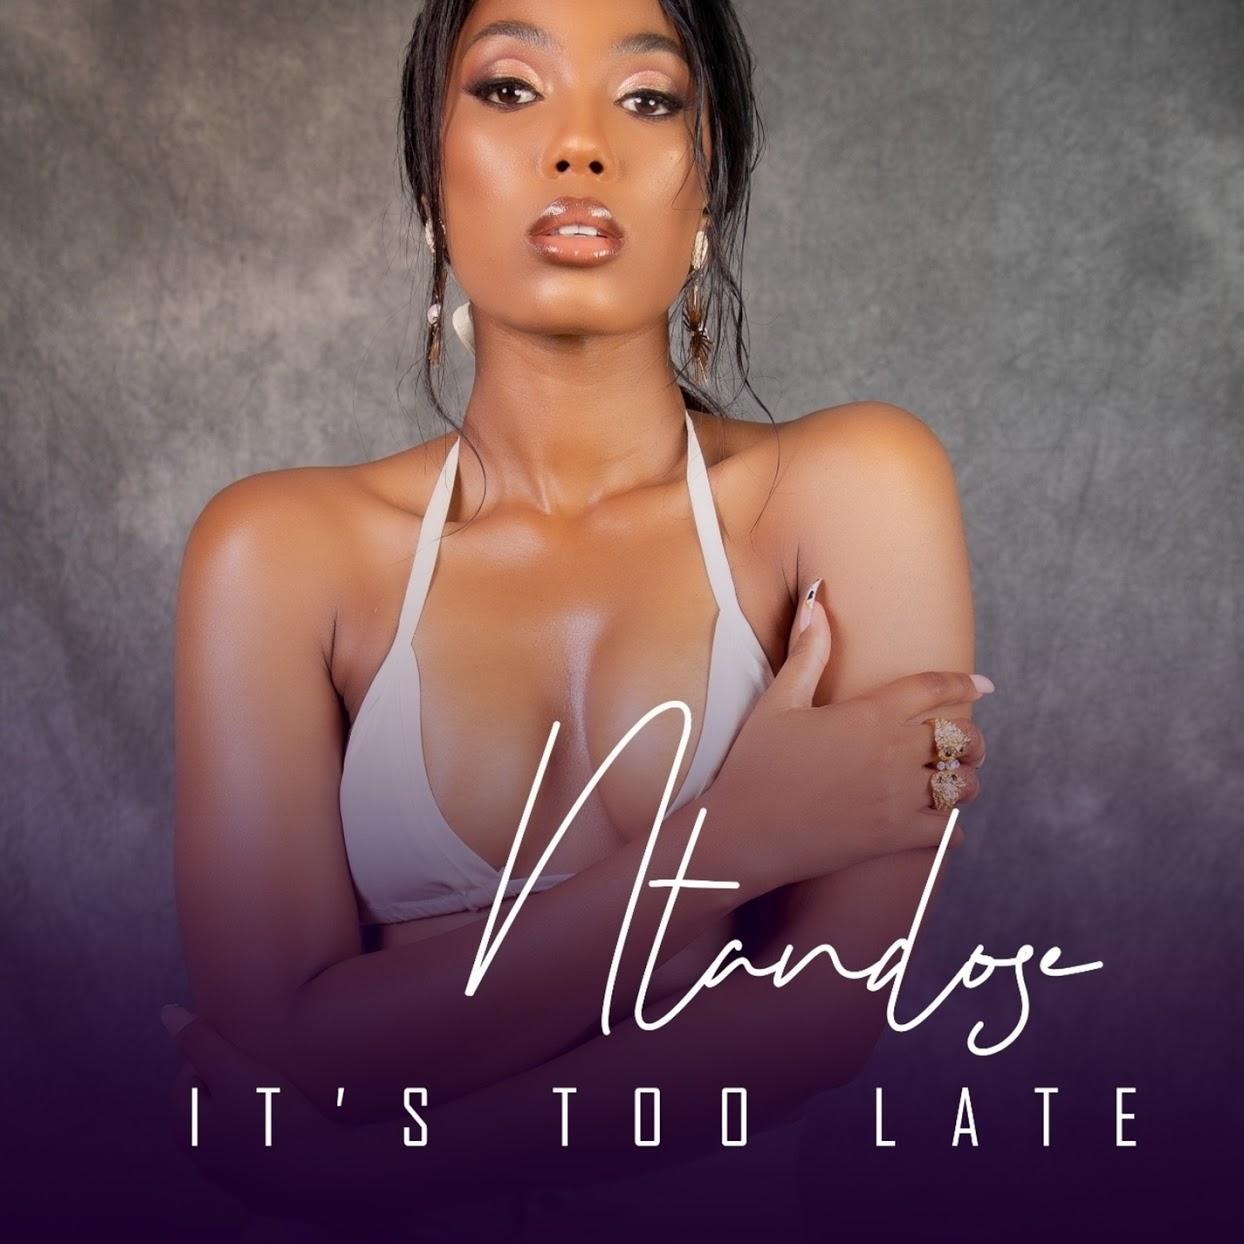 Ntandose - It's Too Late (feat. Liza Miro)